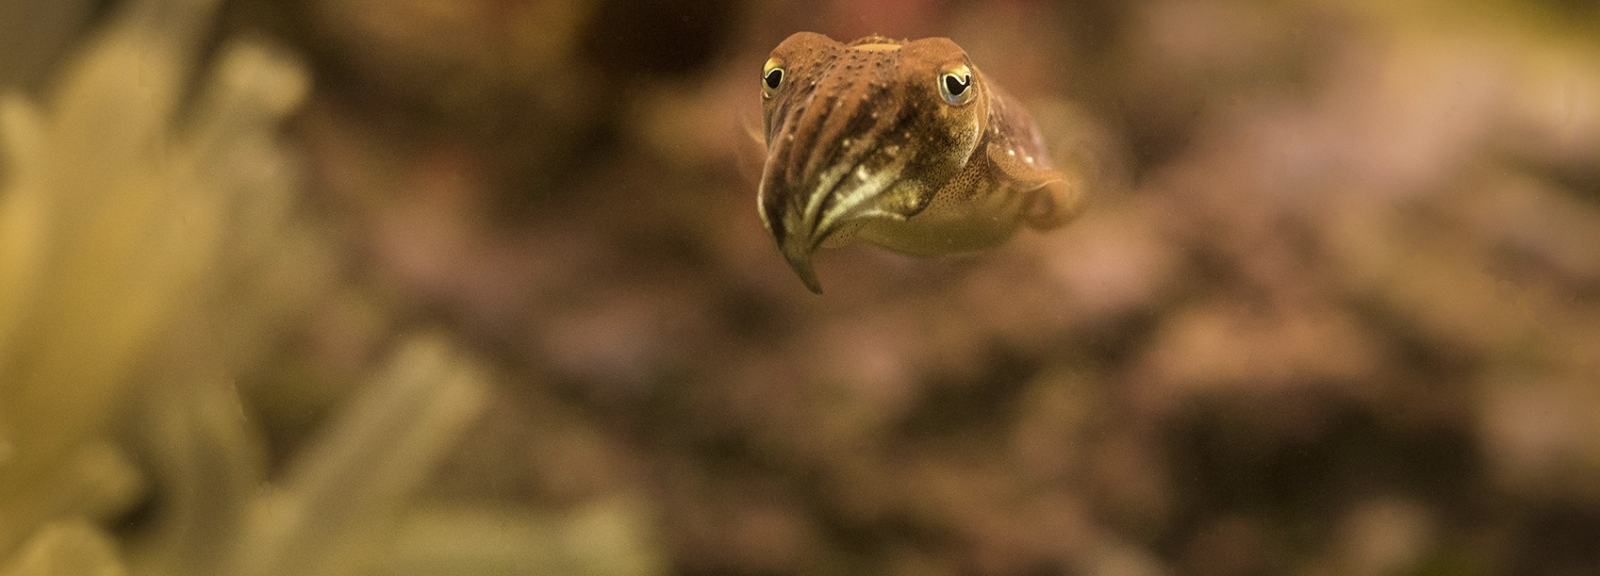 Common cuttlefish (Sepia officinalis) © MNHN - Agnès Iatzoura